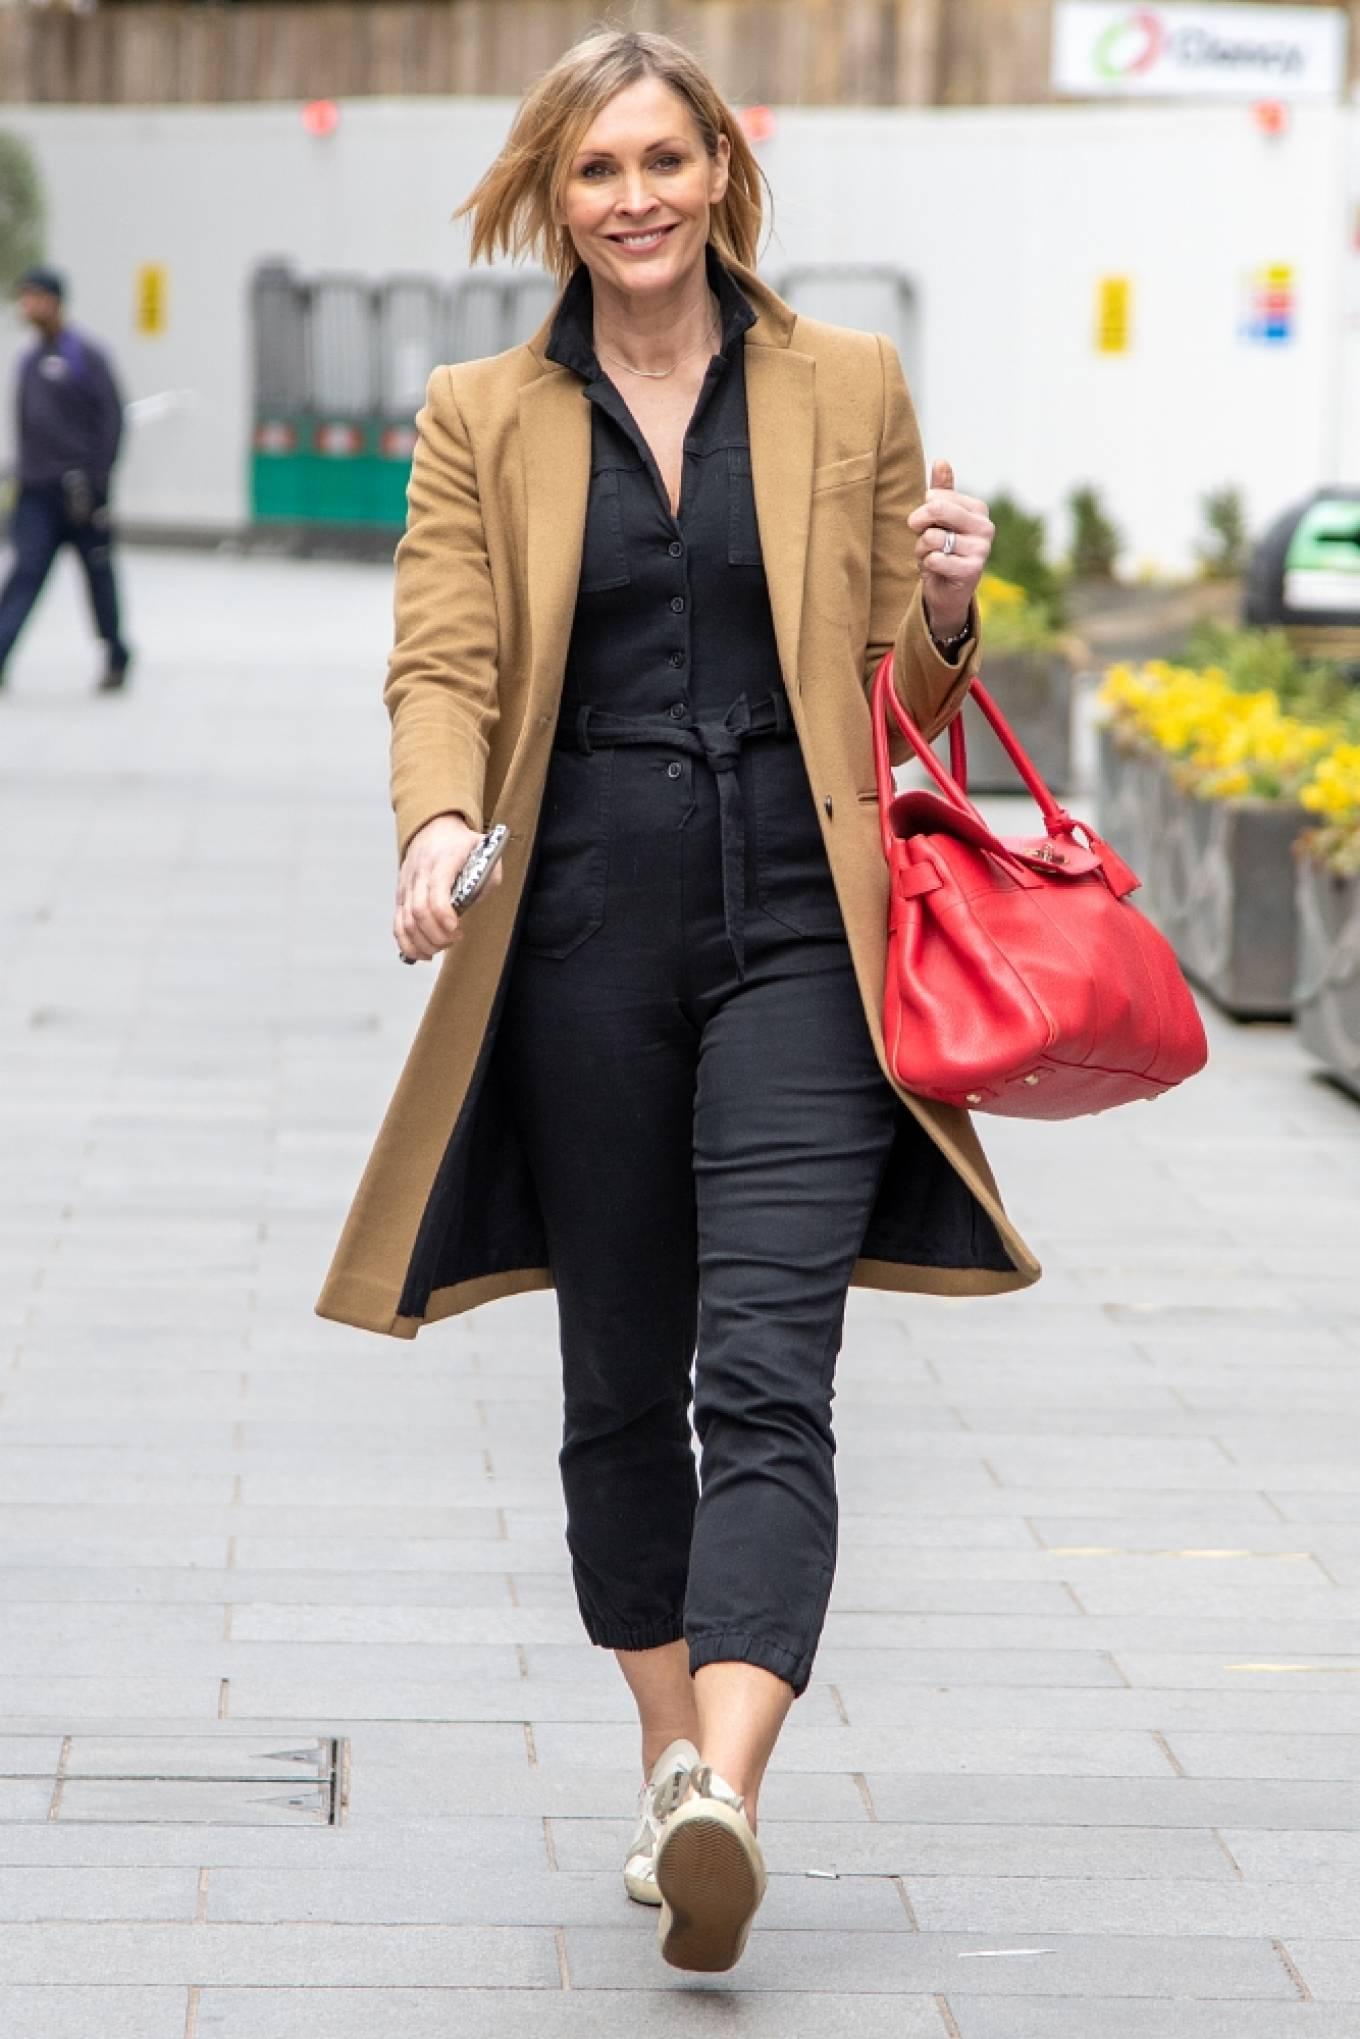 Jenni Falconer 2021 : Jenni Falconer – Seen after radio show in London-01